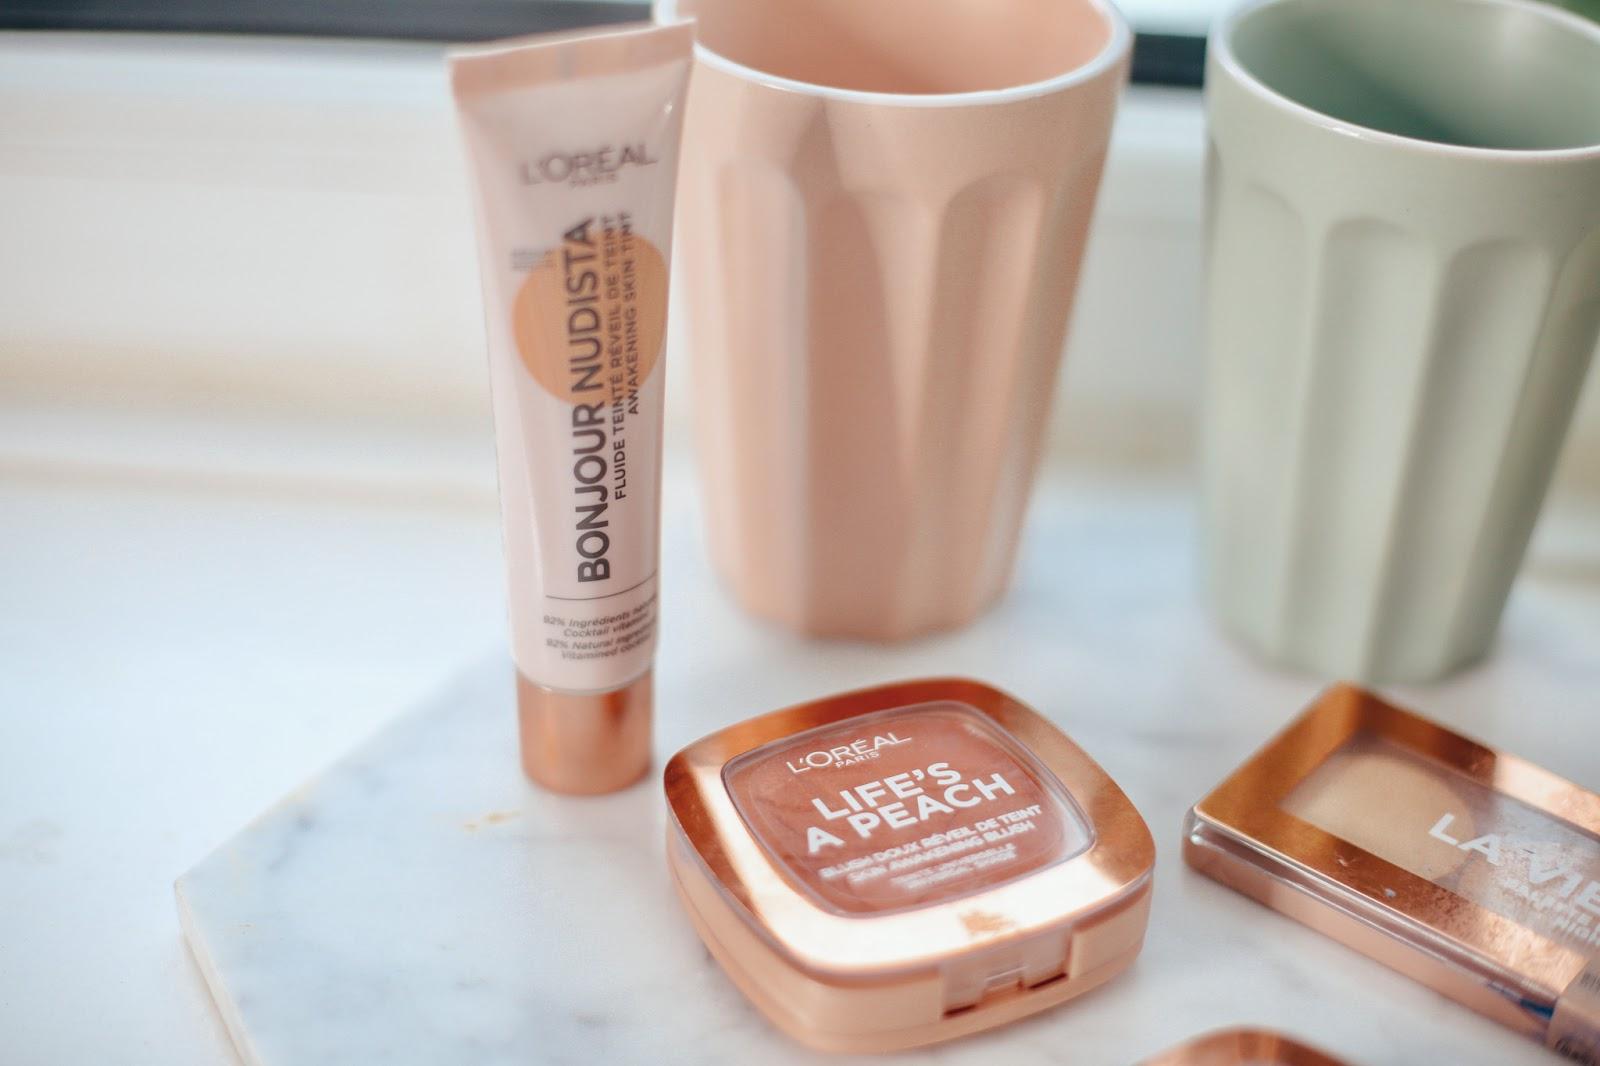 L'Oreal Bonjour Nudista Skin Tint